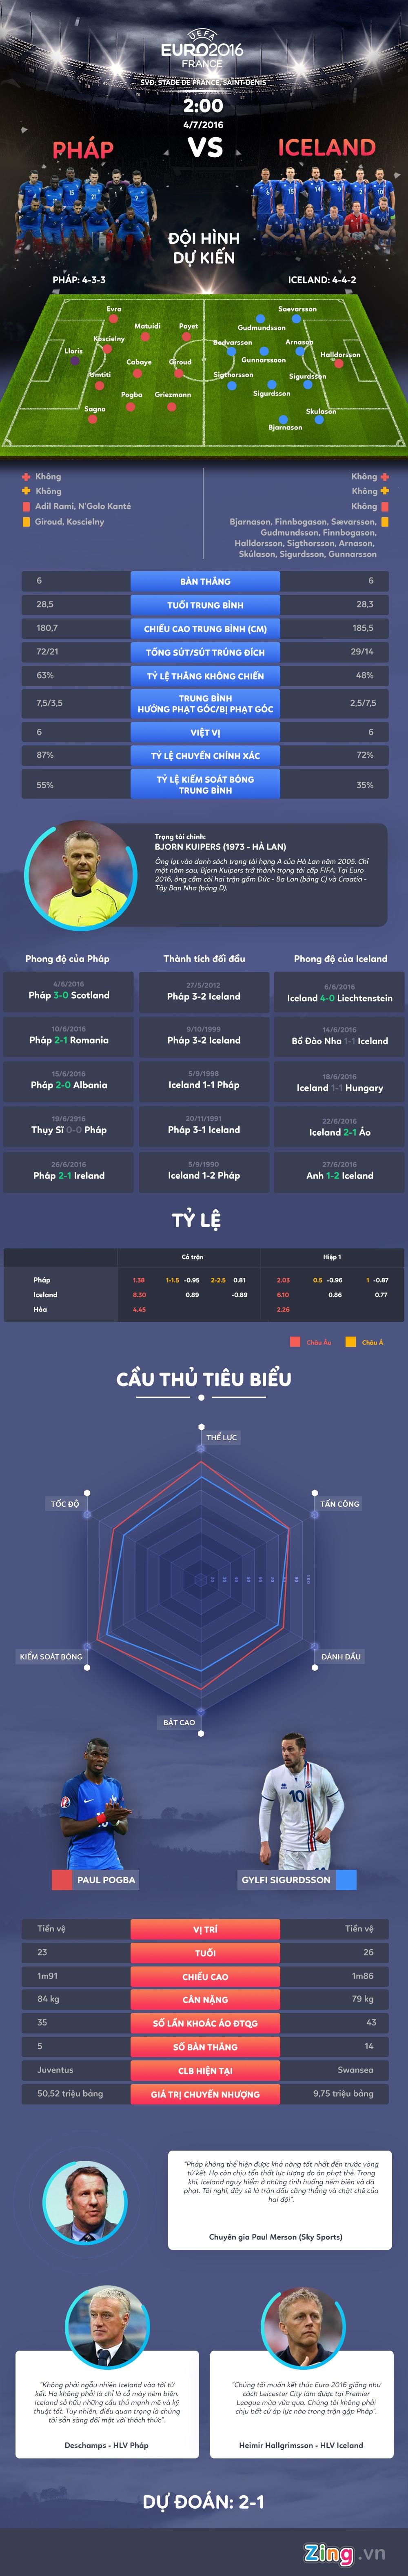 Phap vs Iceland: Chuyen co tich o Euro 2016 hinh anh 1